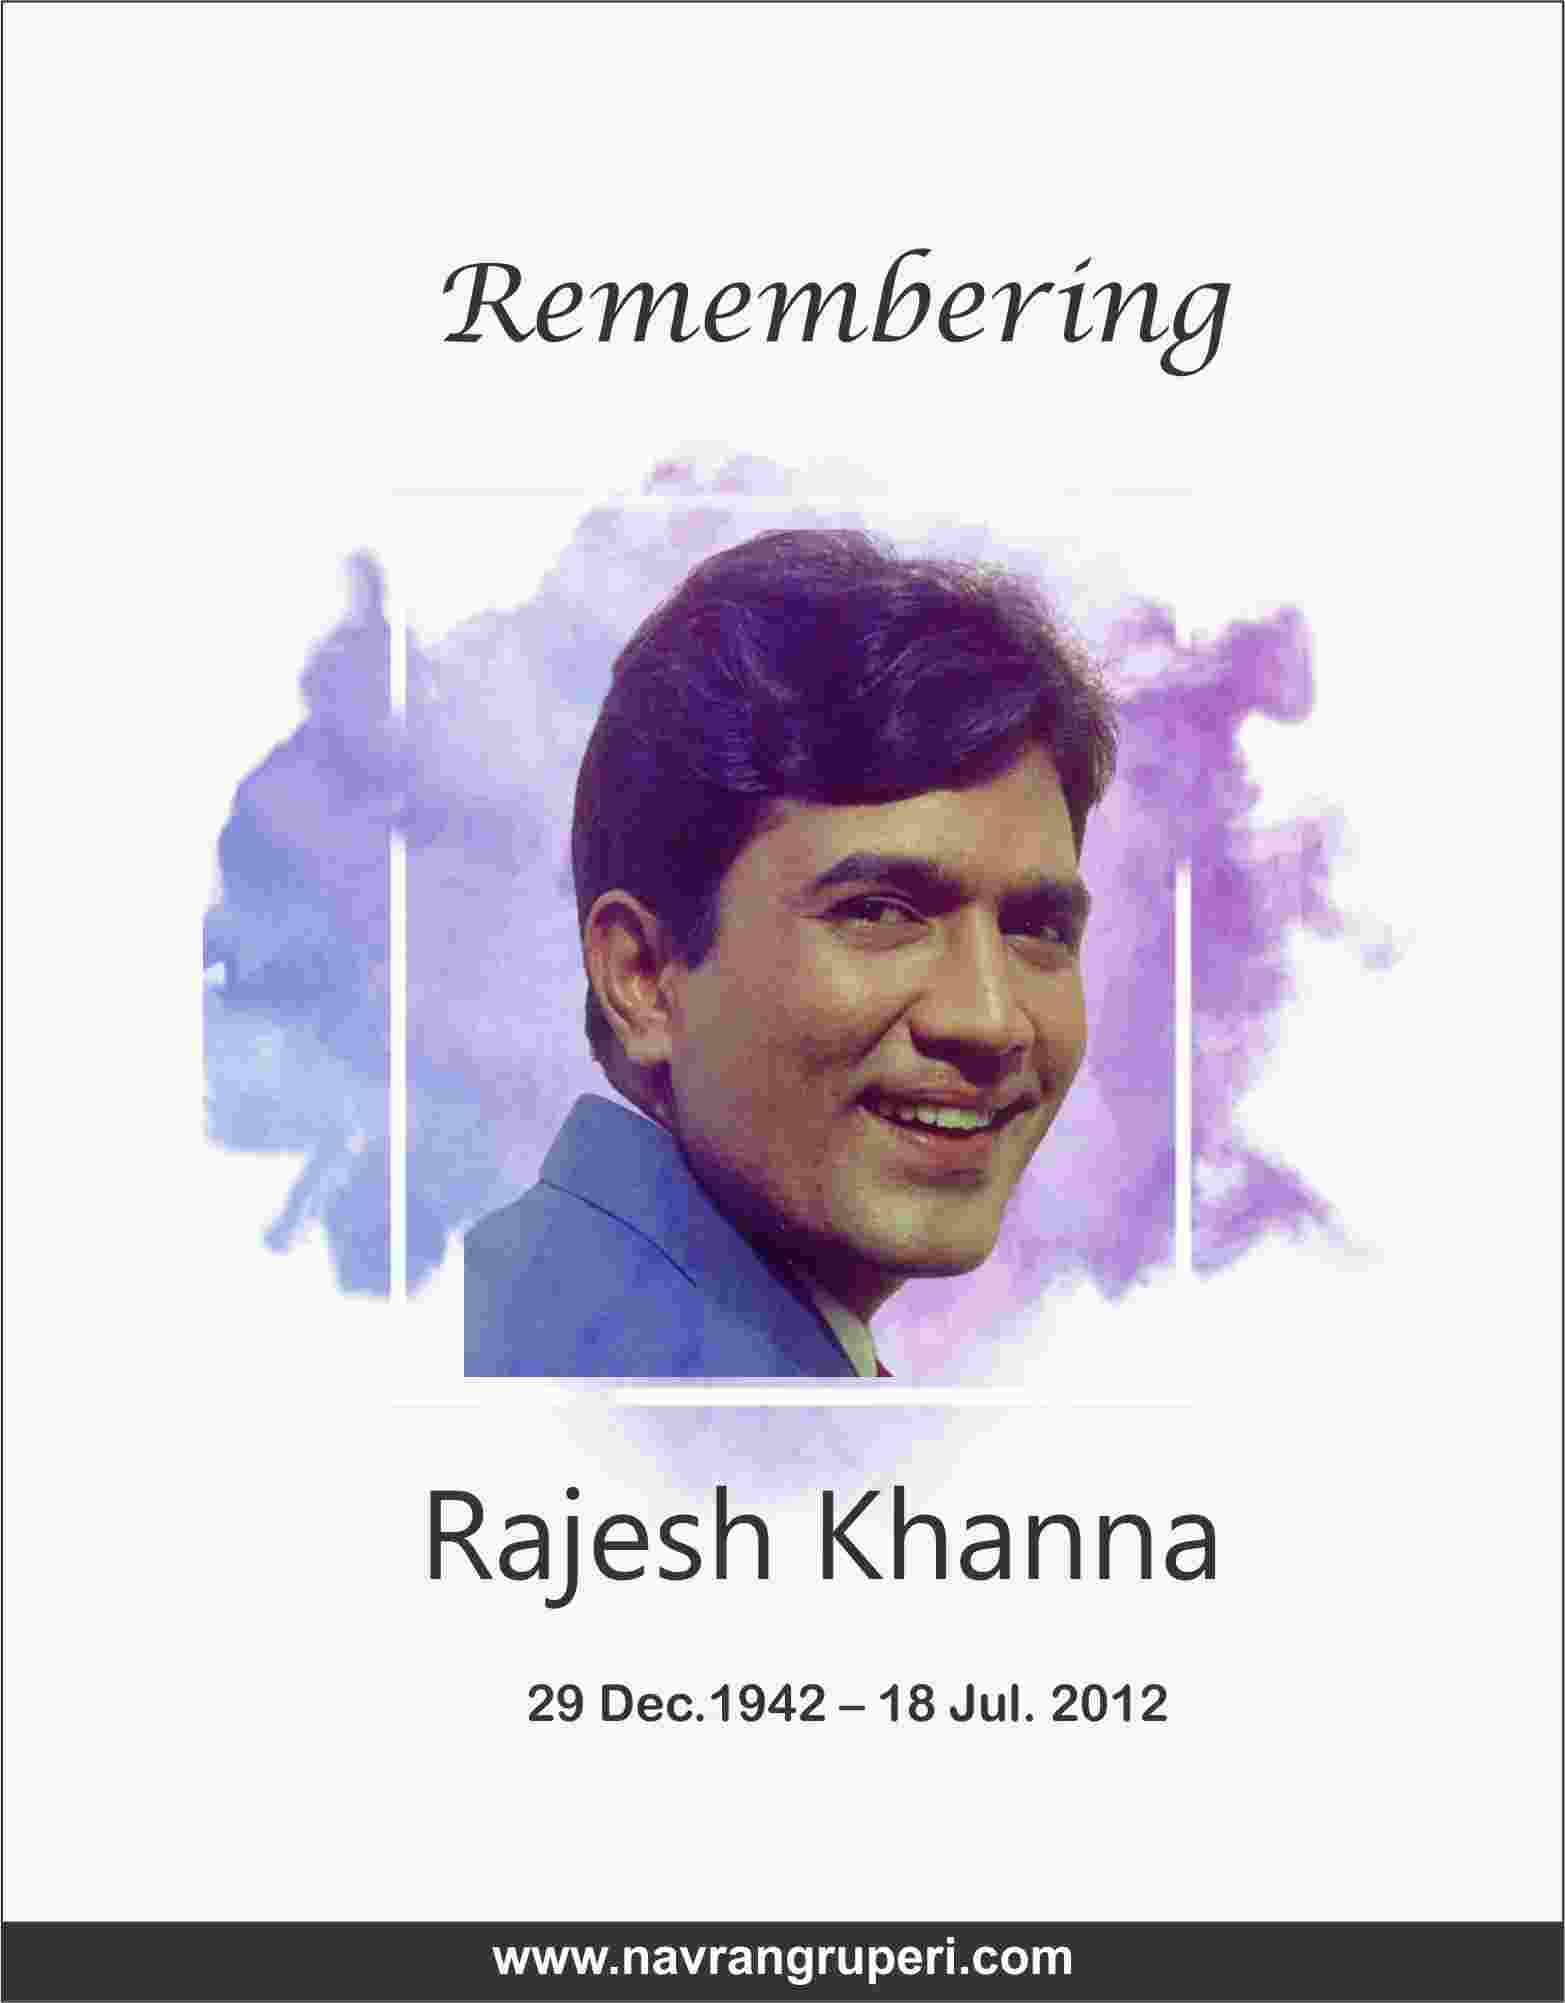 Revisiting Superstar Rajesh Khannas Musical Journey